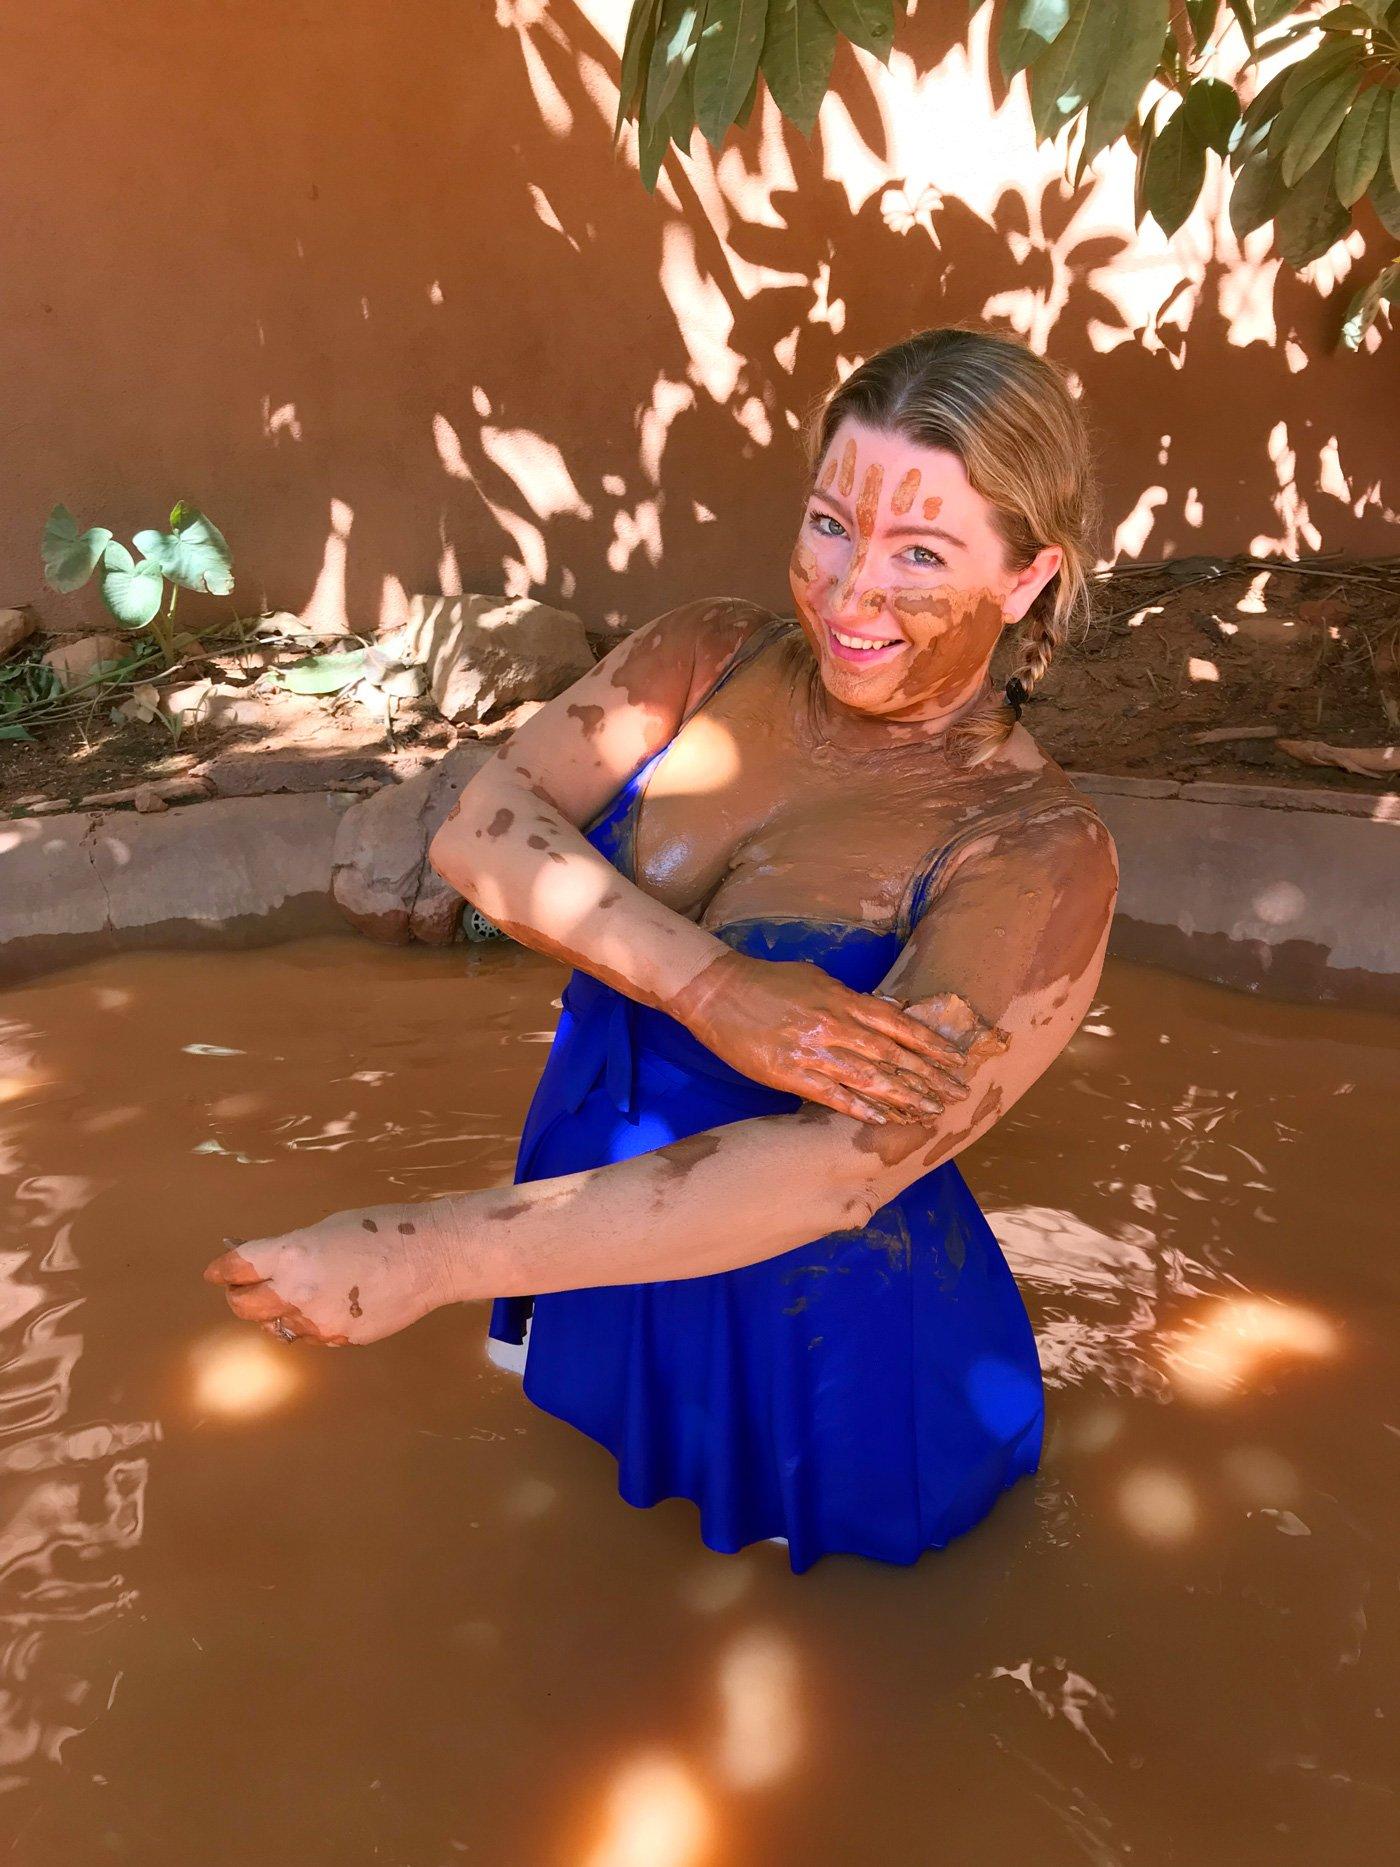 Natasha Octon at Club Mud